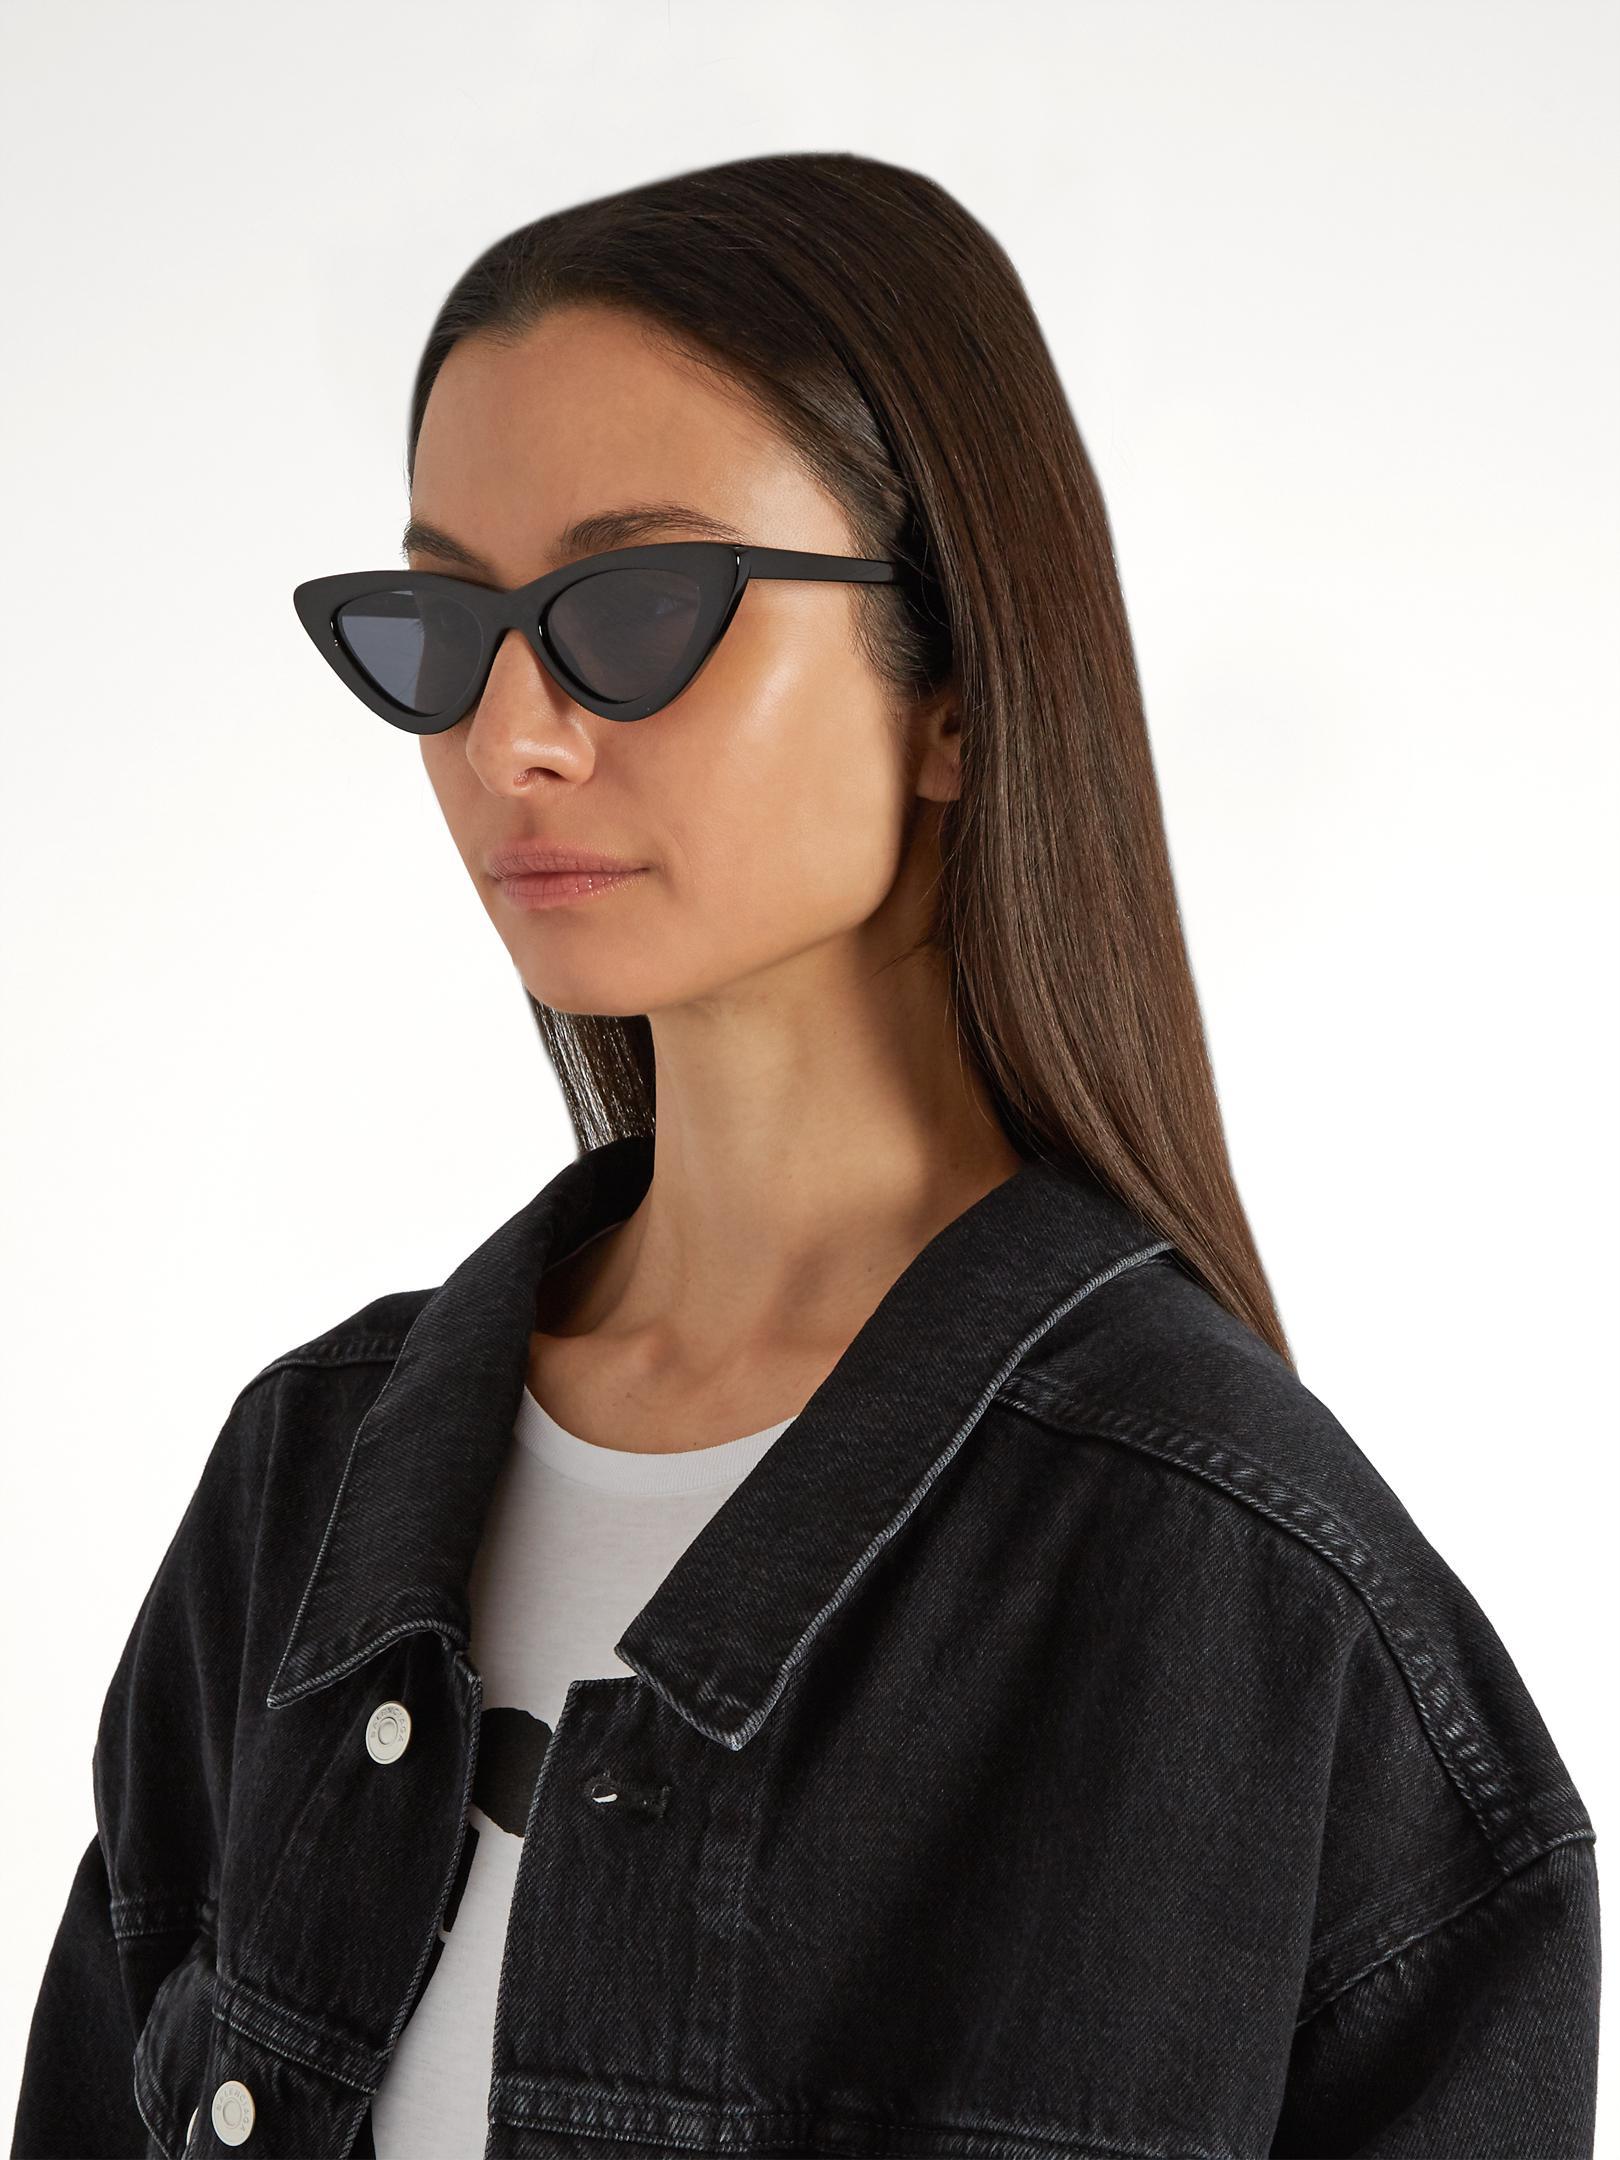 ae3371cc4d Lyst - Le Specs The Last Lolita Cat-eye Sunglasses in Black